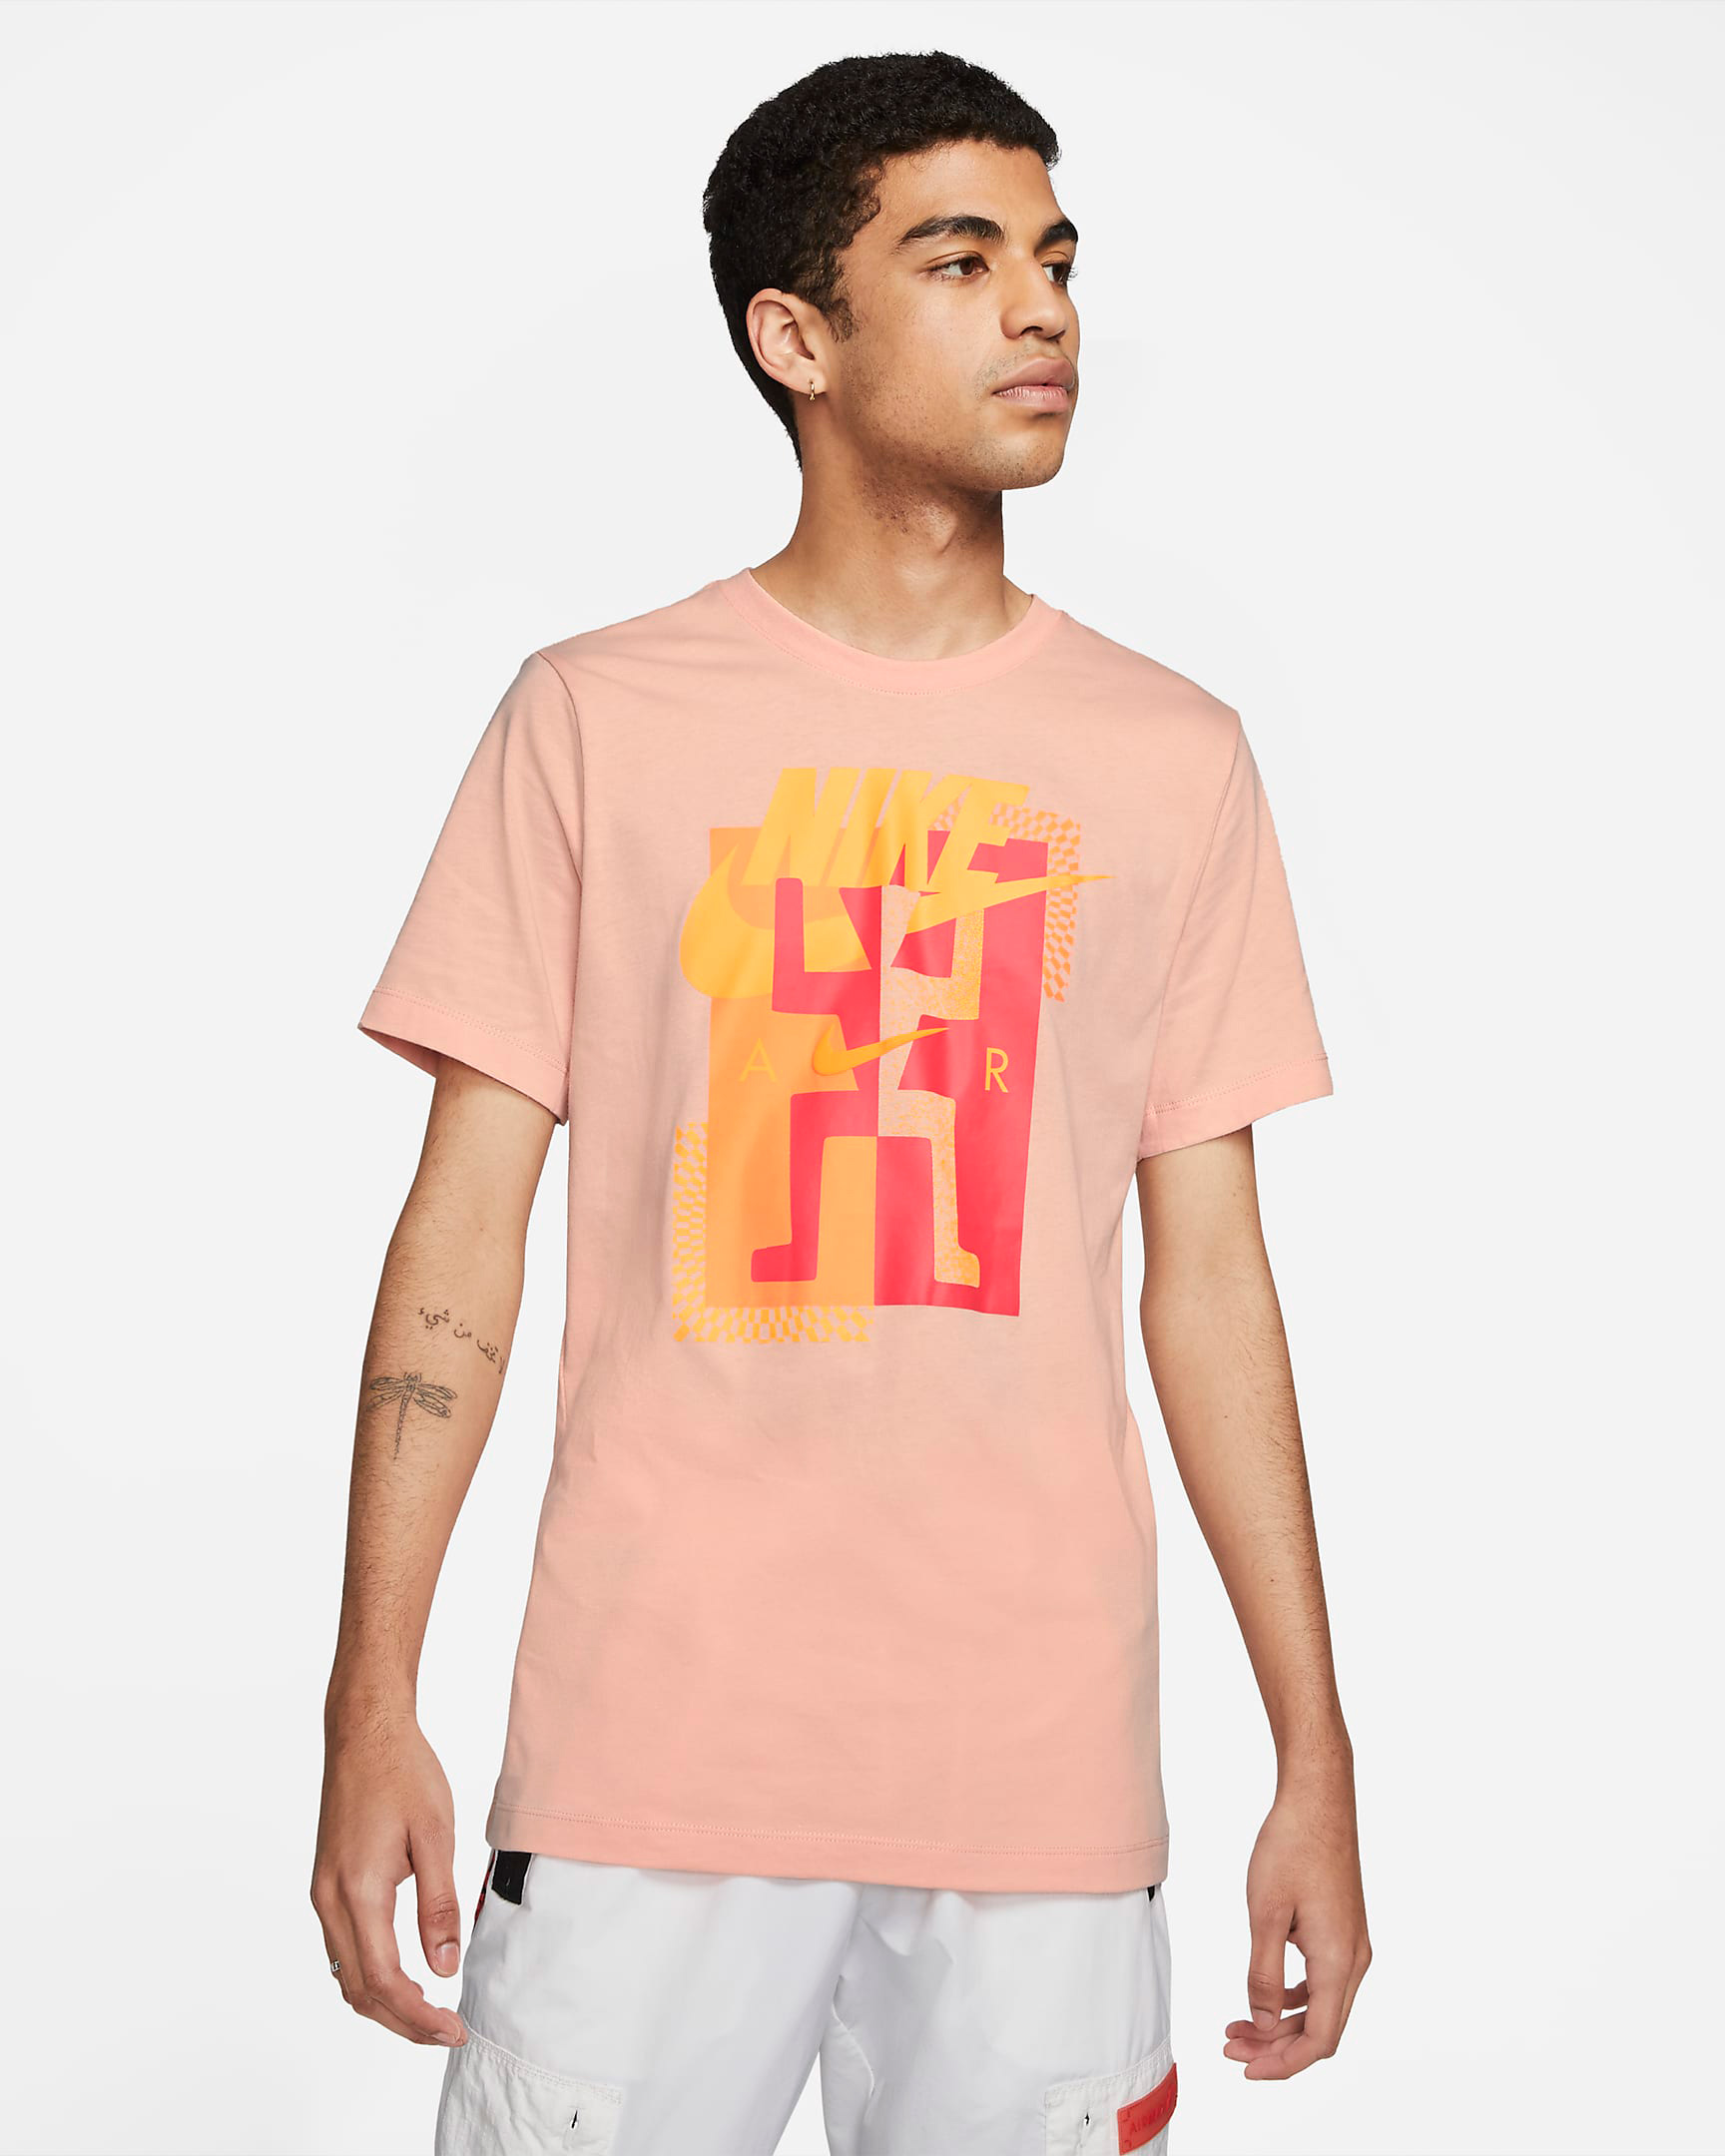 nike-arctic-orange-nike-air-t-shirt